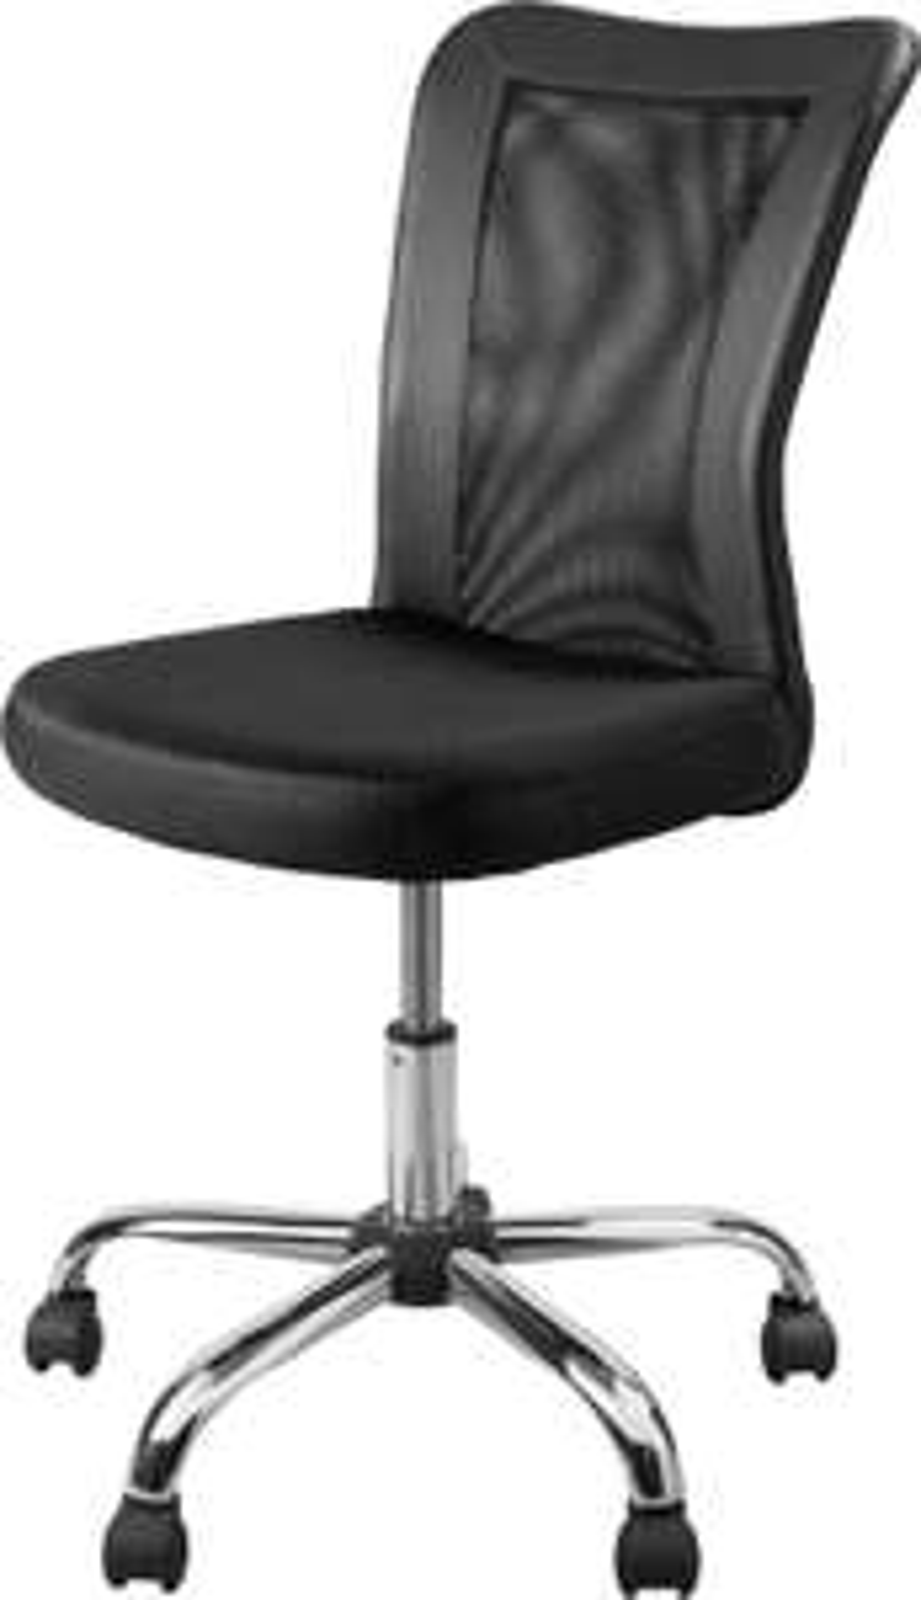 Argos Home Reade Mesh Office Chair - Black £32 at Argos